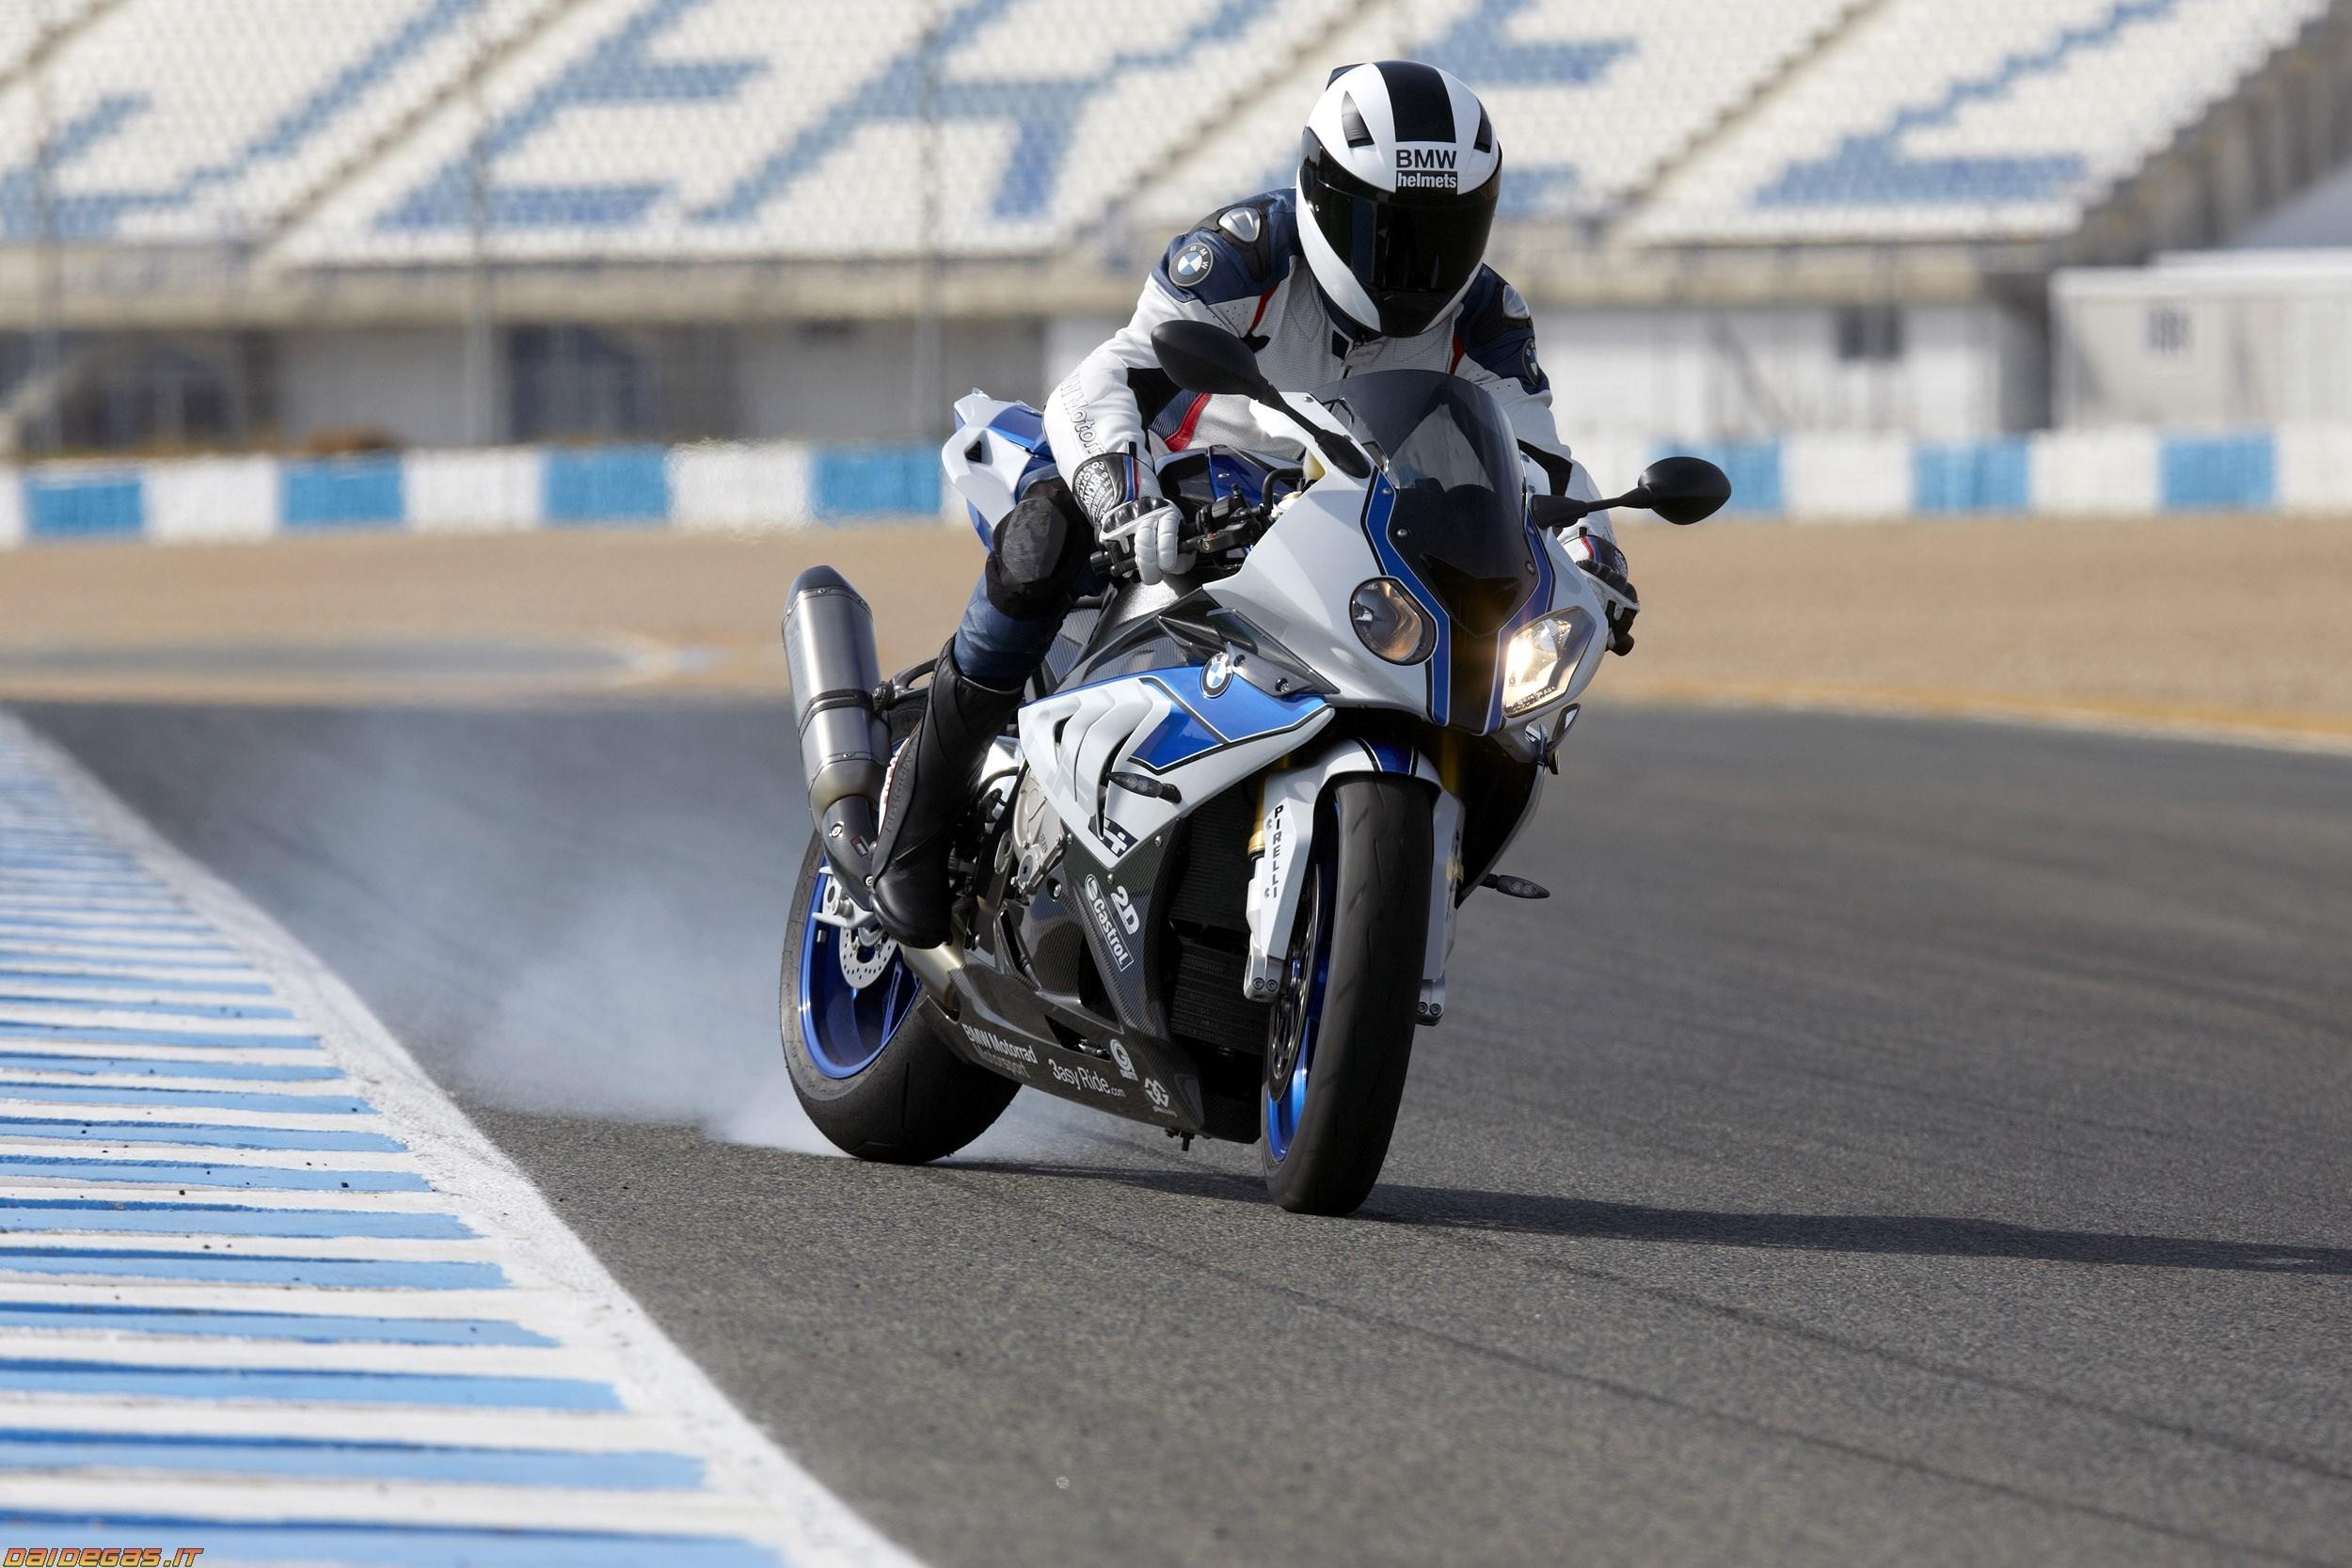 1440x2960 Bmw S1000rr White Motorcycle